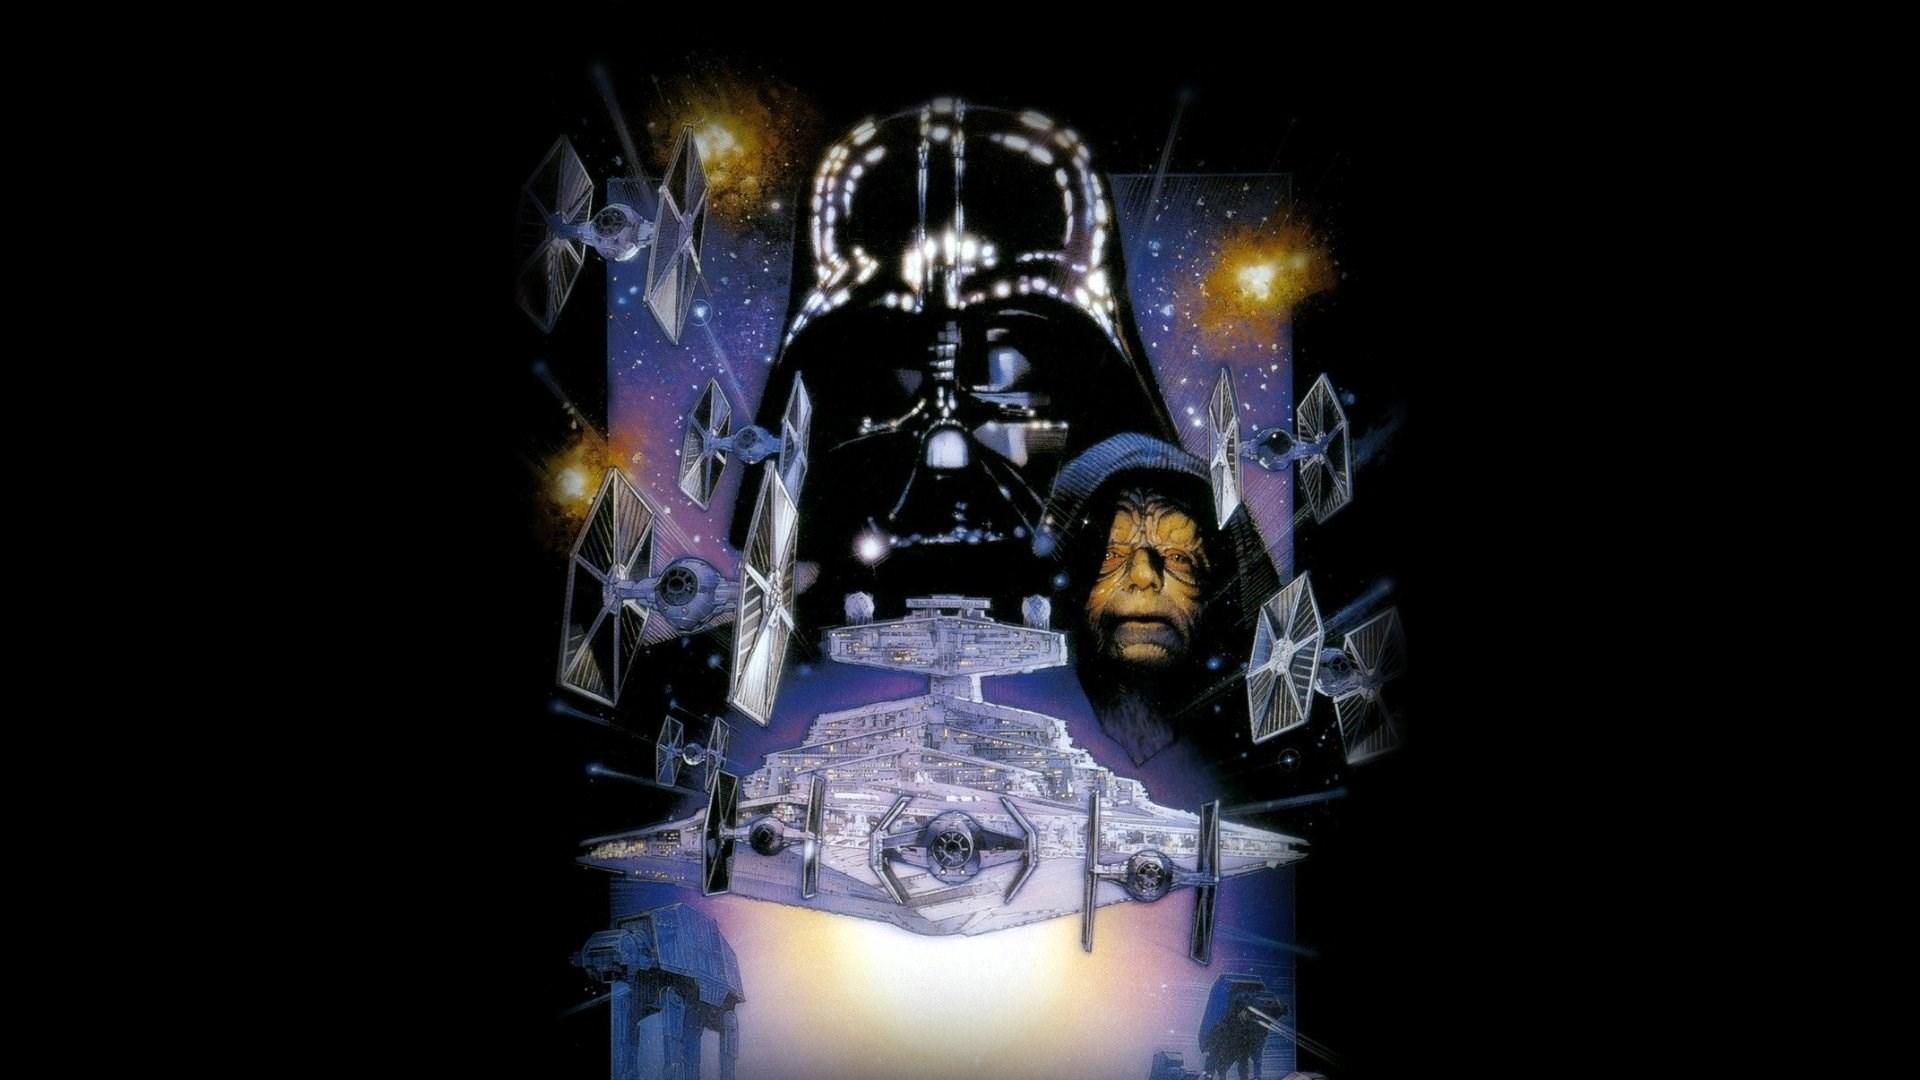 Free Download Star Wars Episode V The Empire Strikes Back Wallpaper 9 1920 X 1920x1080 For Your Desktop Mobile Tablet Explore 36 Star Wars Episode V The Empire Strikes